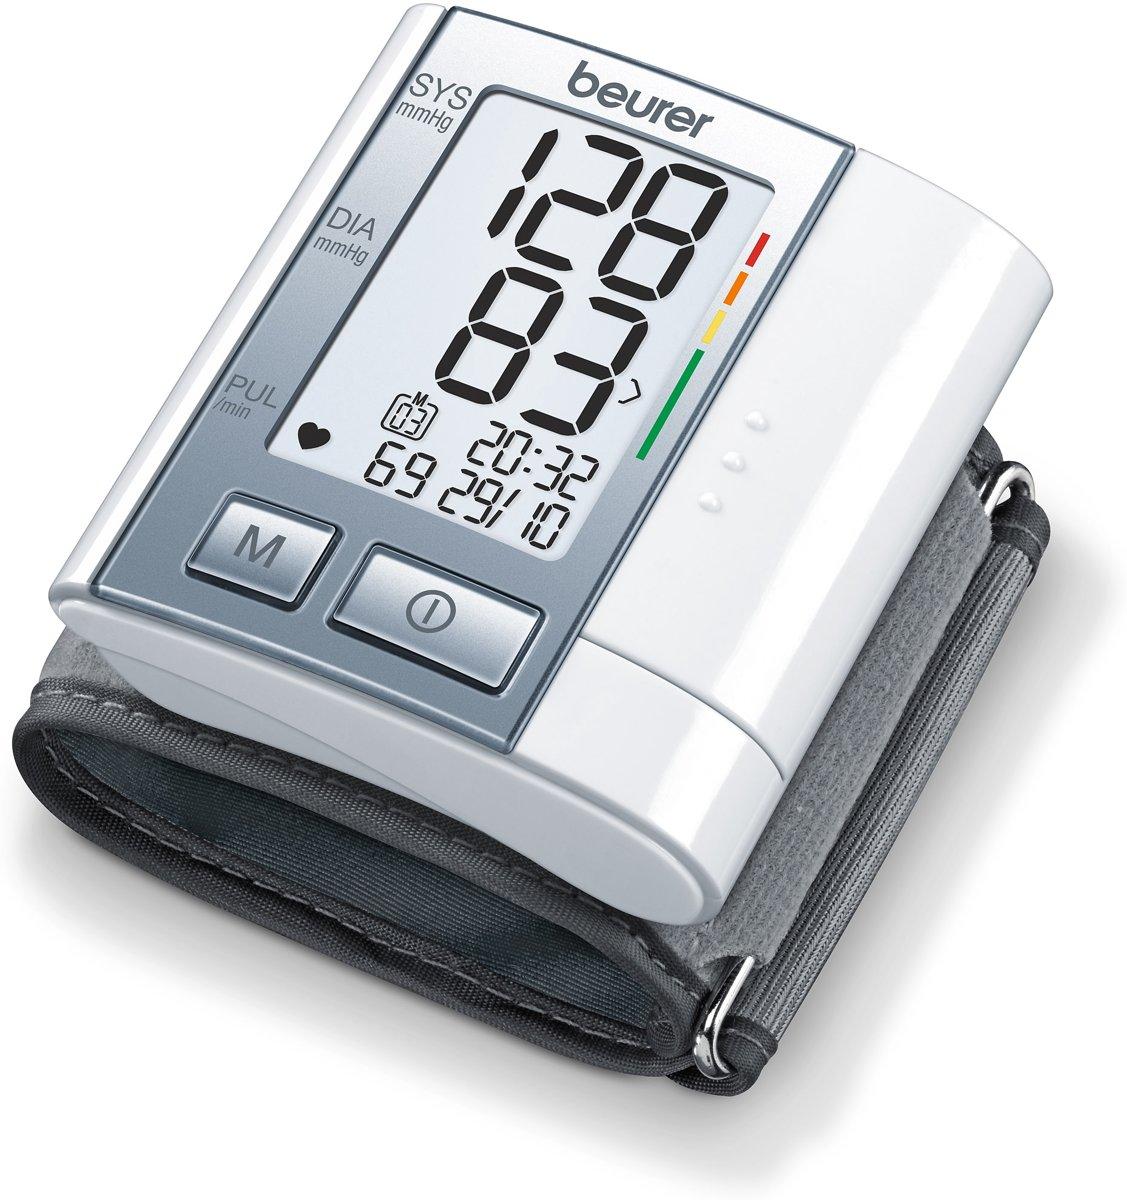 Beurer BC40 - Bloeddrukmeter Pols